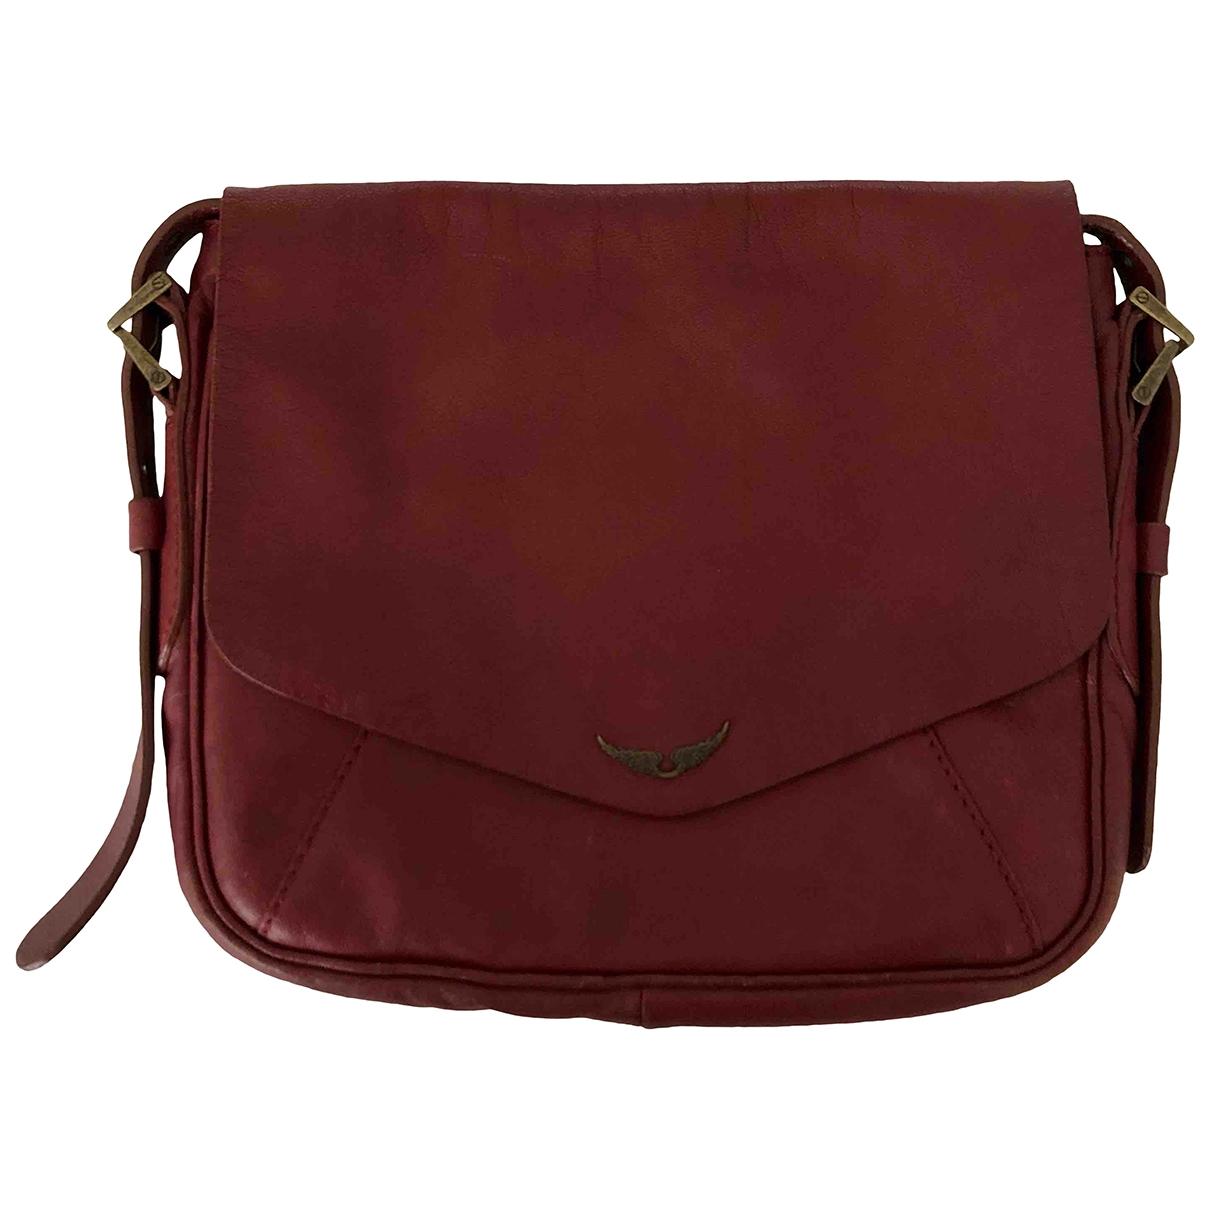 Zadig & Voltaire \N Burgundy Leather handbag for Women \N